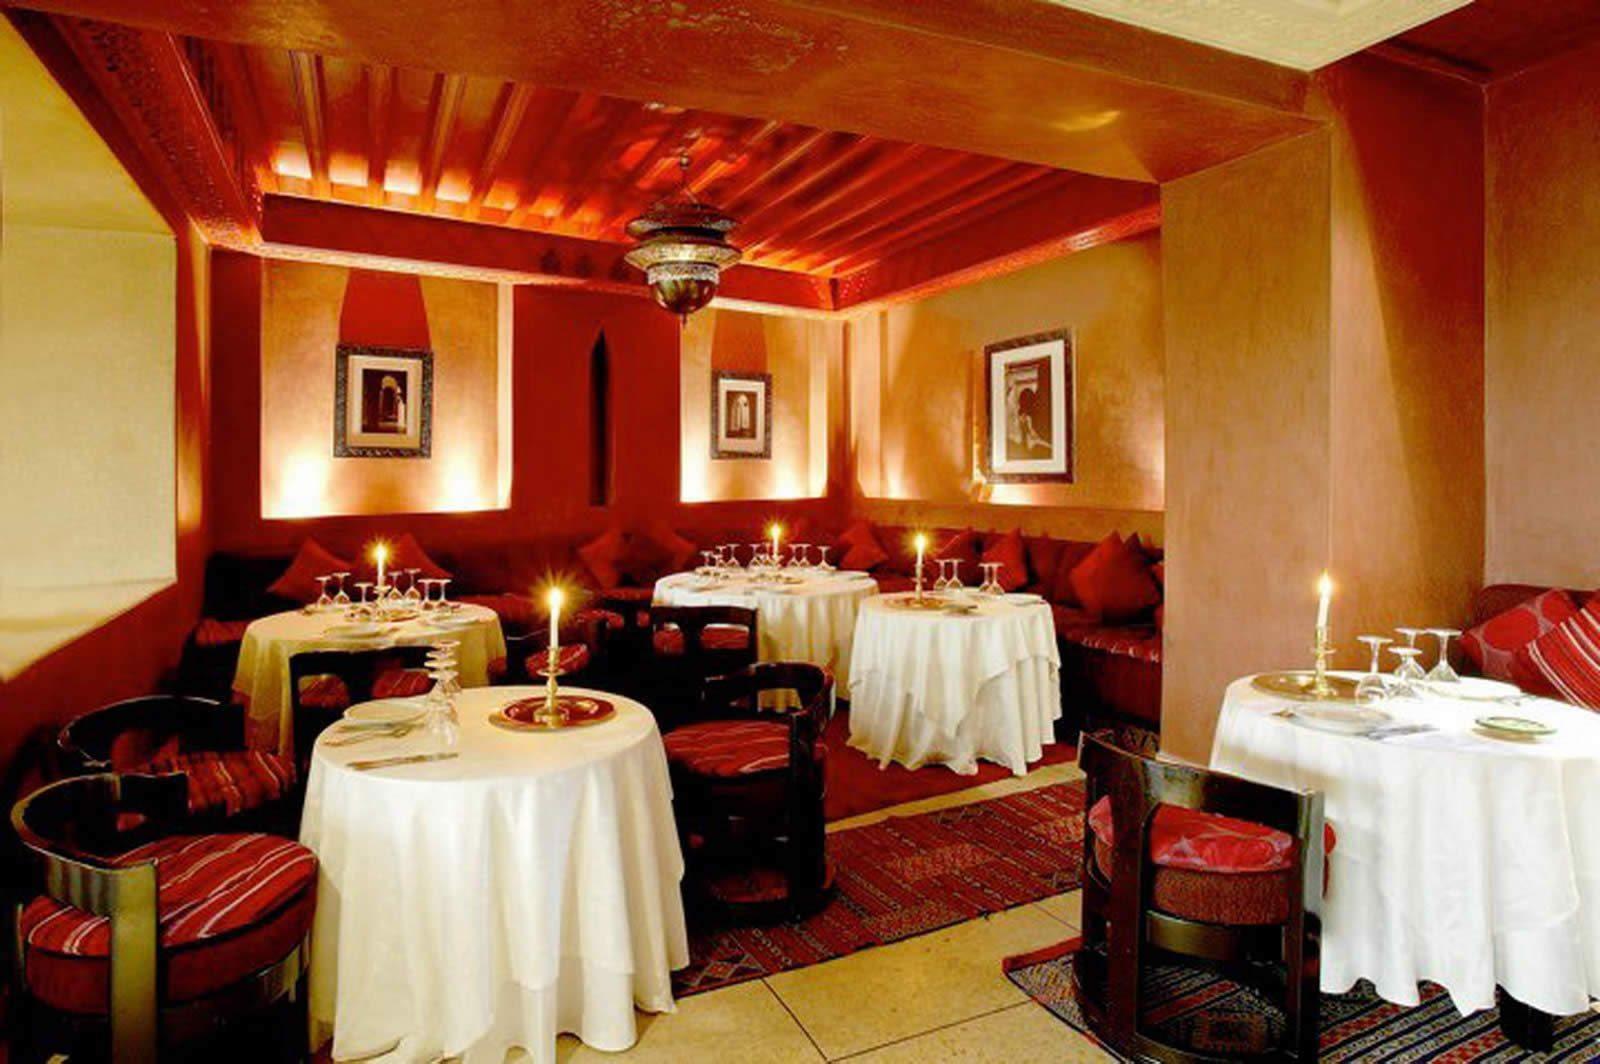 al-fassia-restaurant-gastronomique-traditionnel-quartier-gueliz